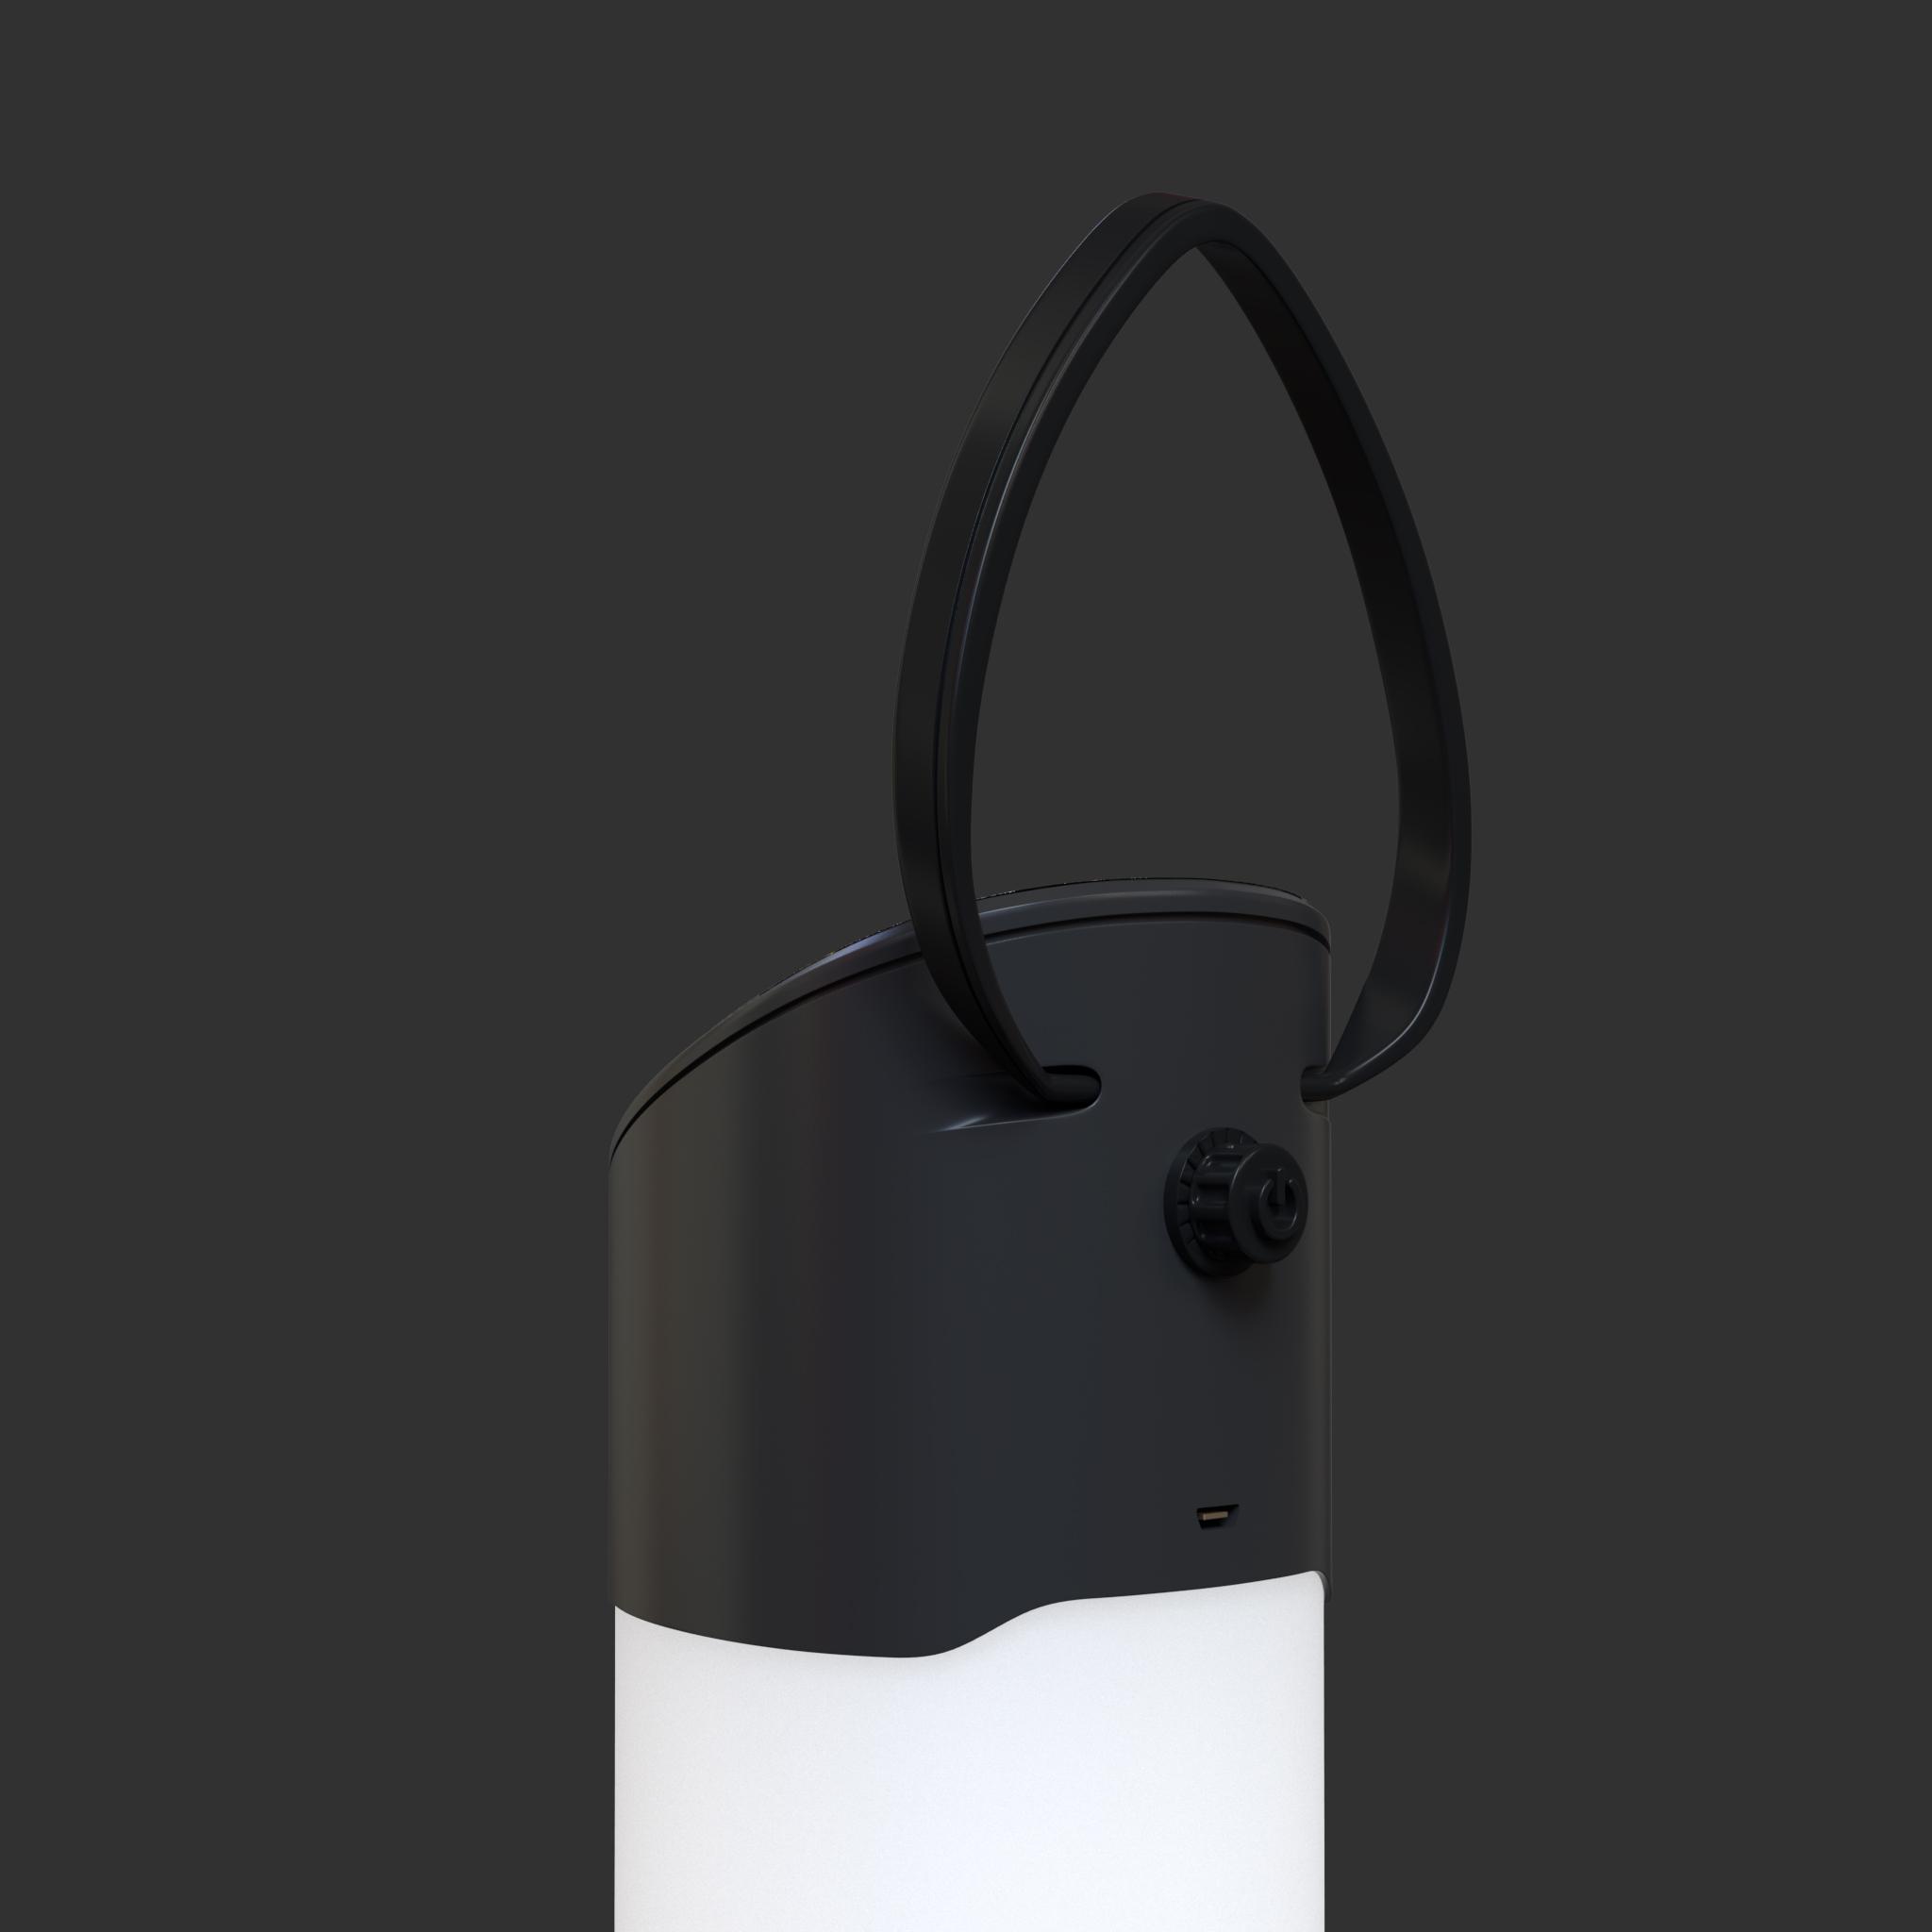 Solar Lantern with USB charging Socket